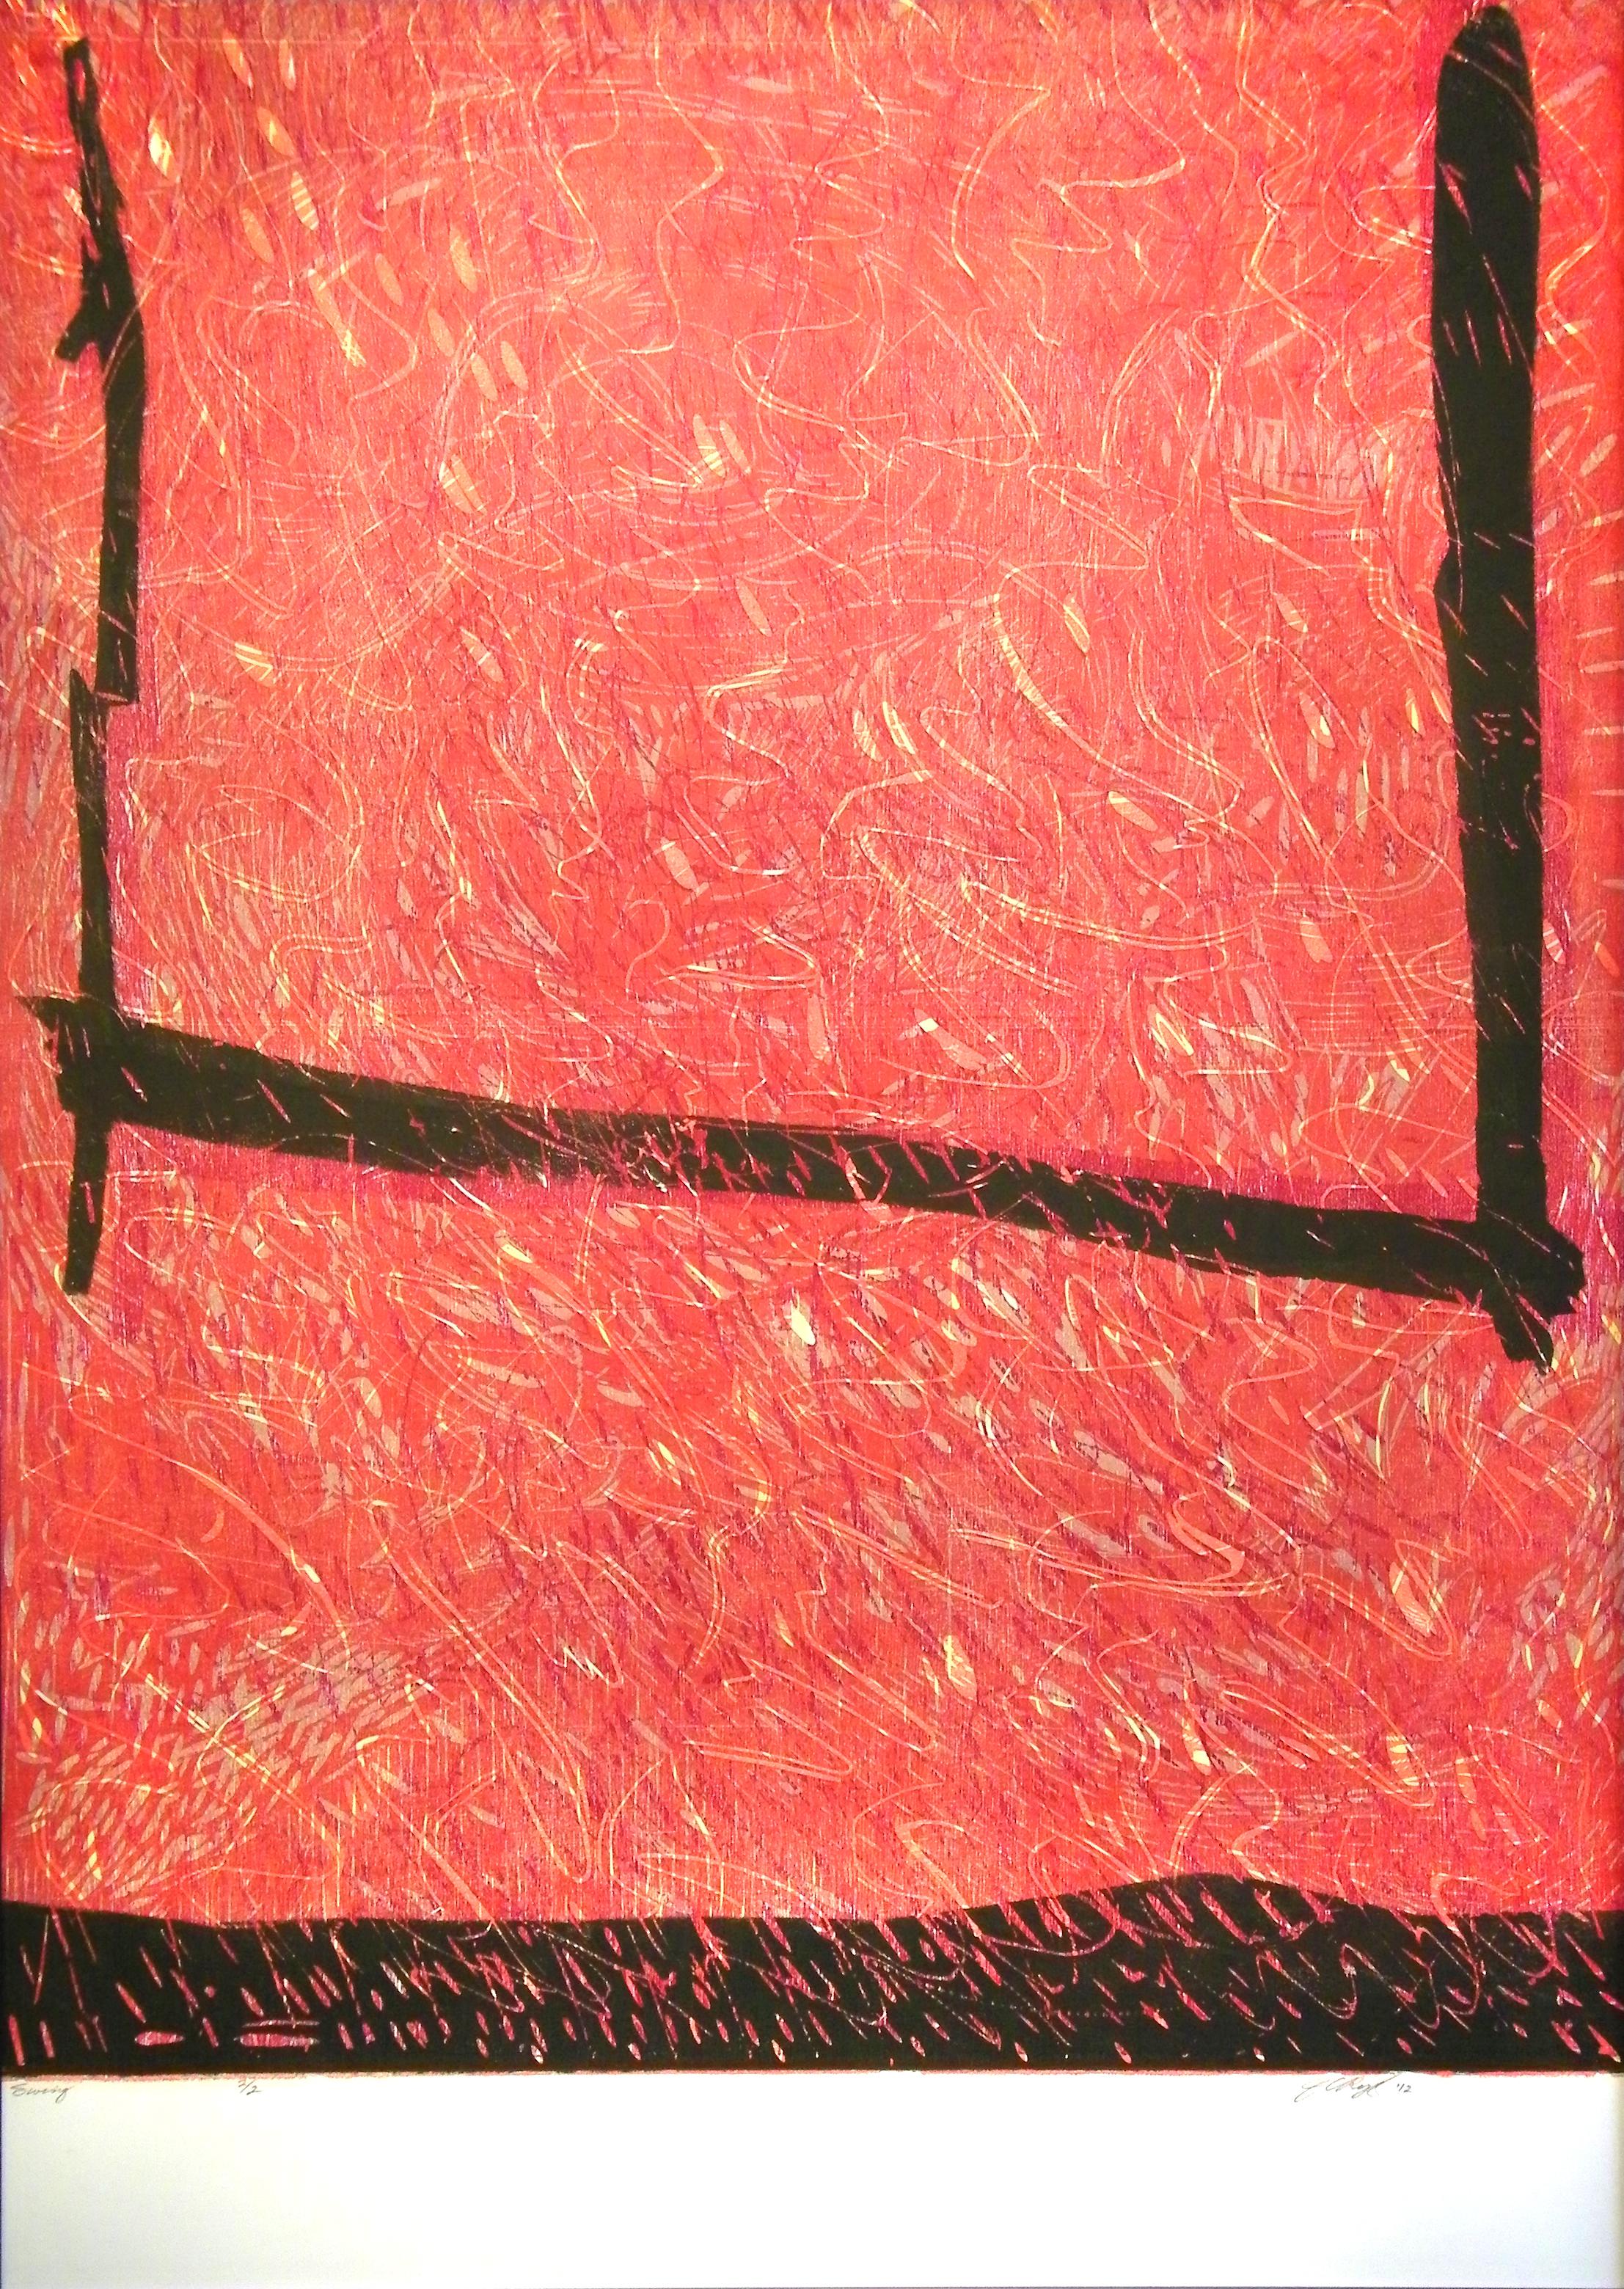 "Swing  2012  woodcut print (2/2)  43 1/4"" x 31 3/8"""